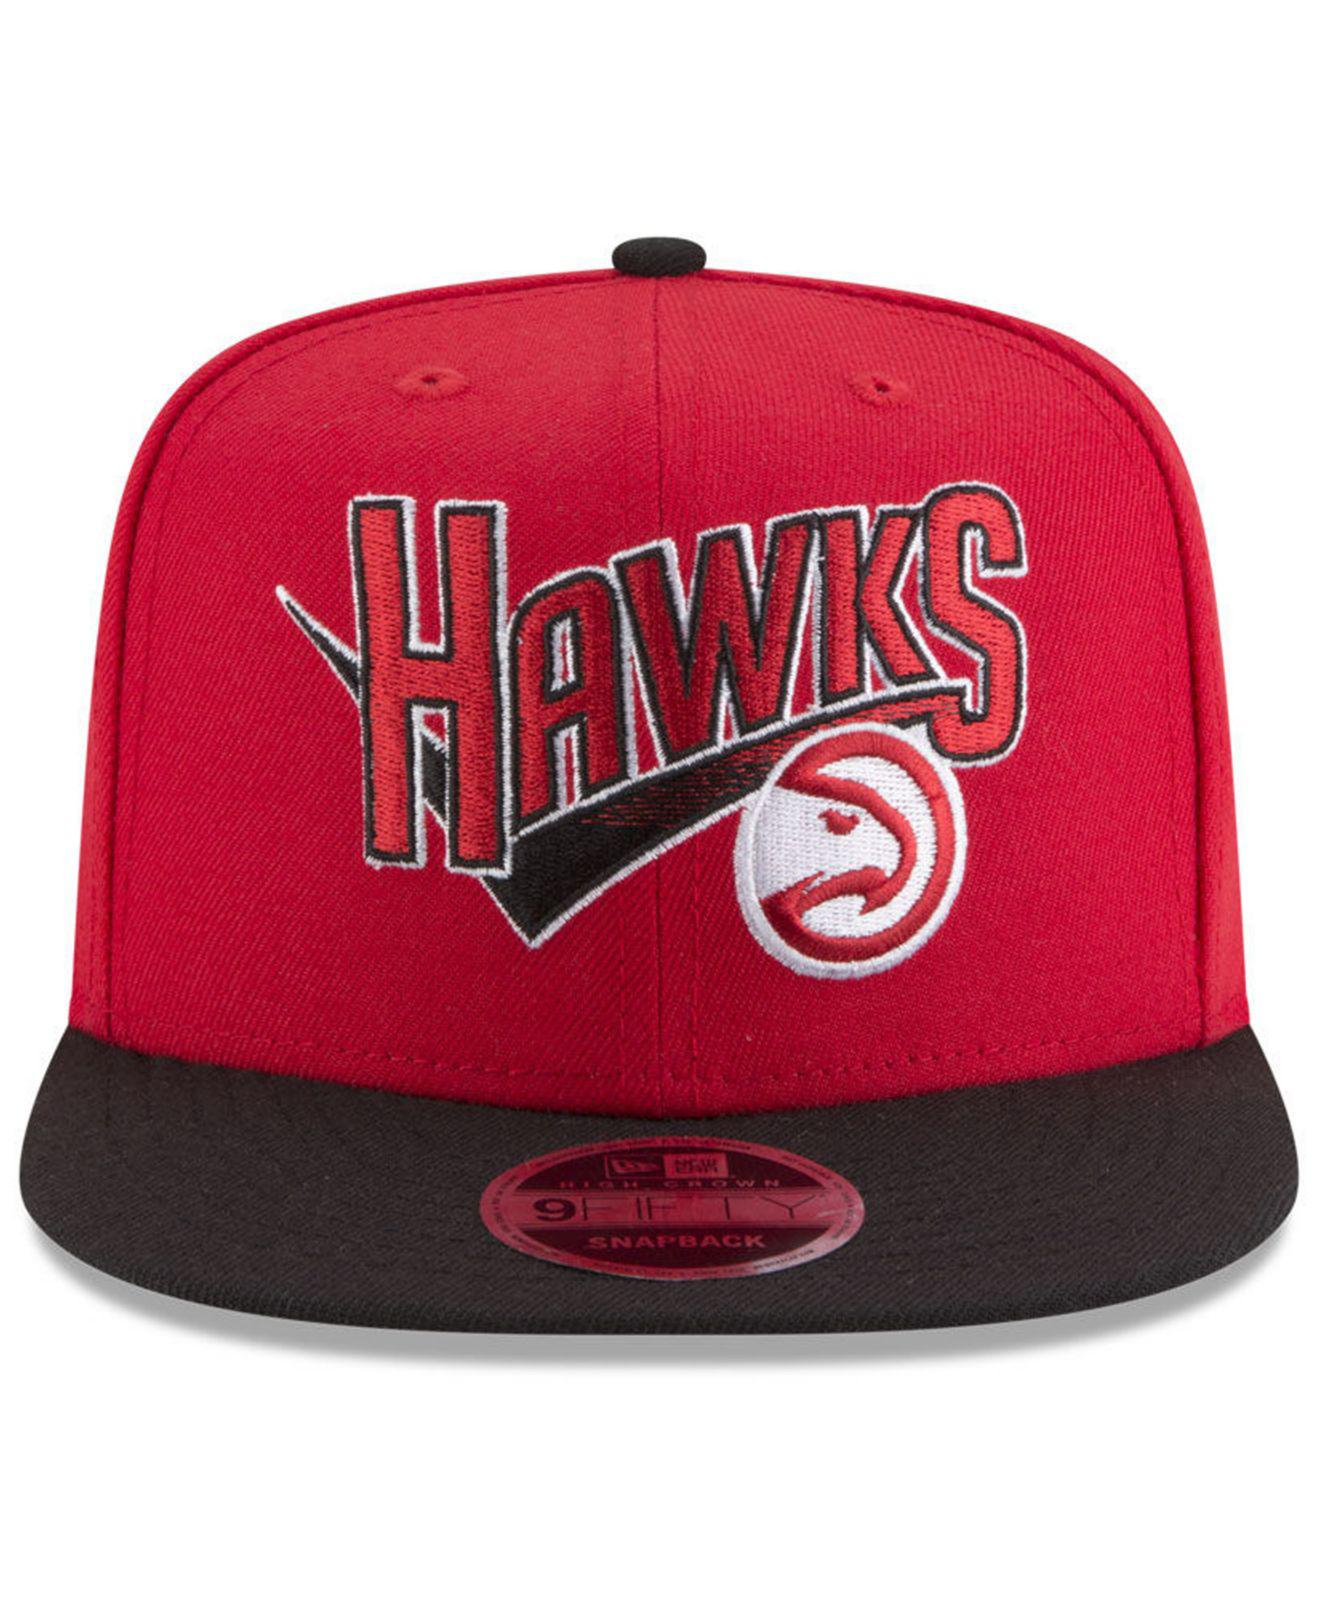 e04e2c79fa0 Lyst - Ktz Atlanta Hawks Retro Tail 9fifty Snapback Cap in Red for Men